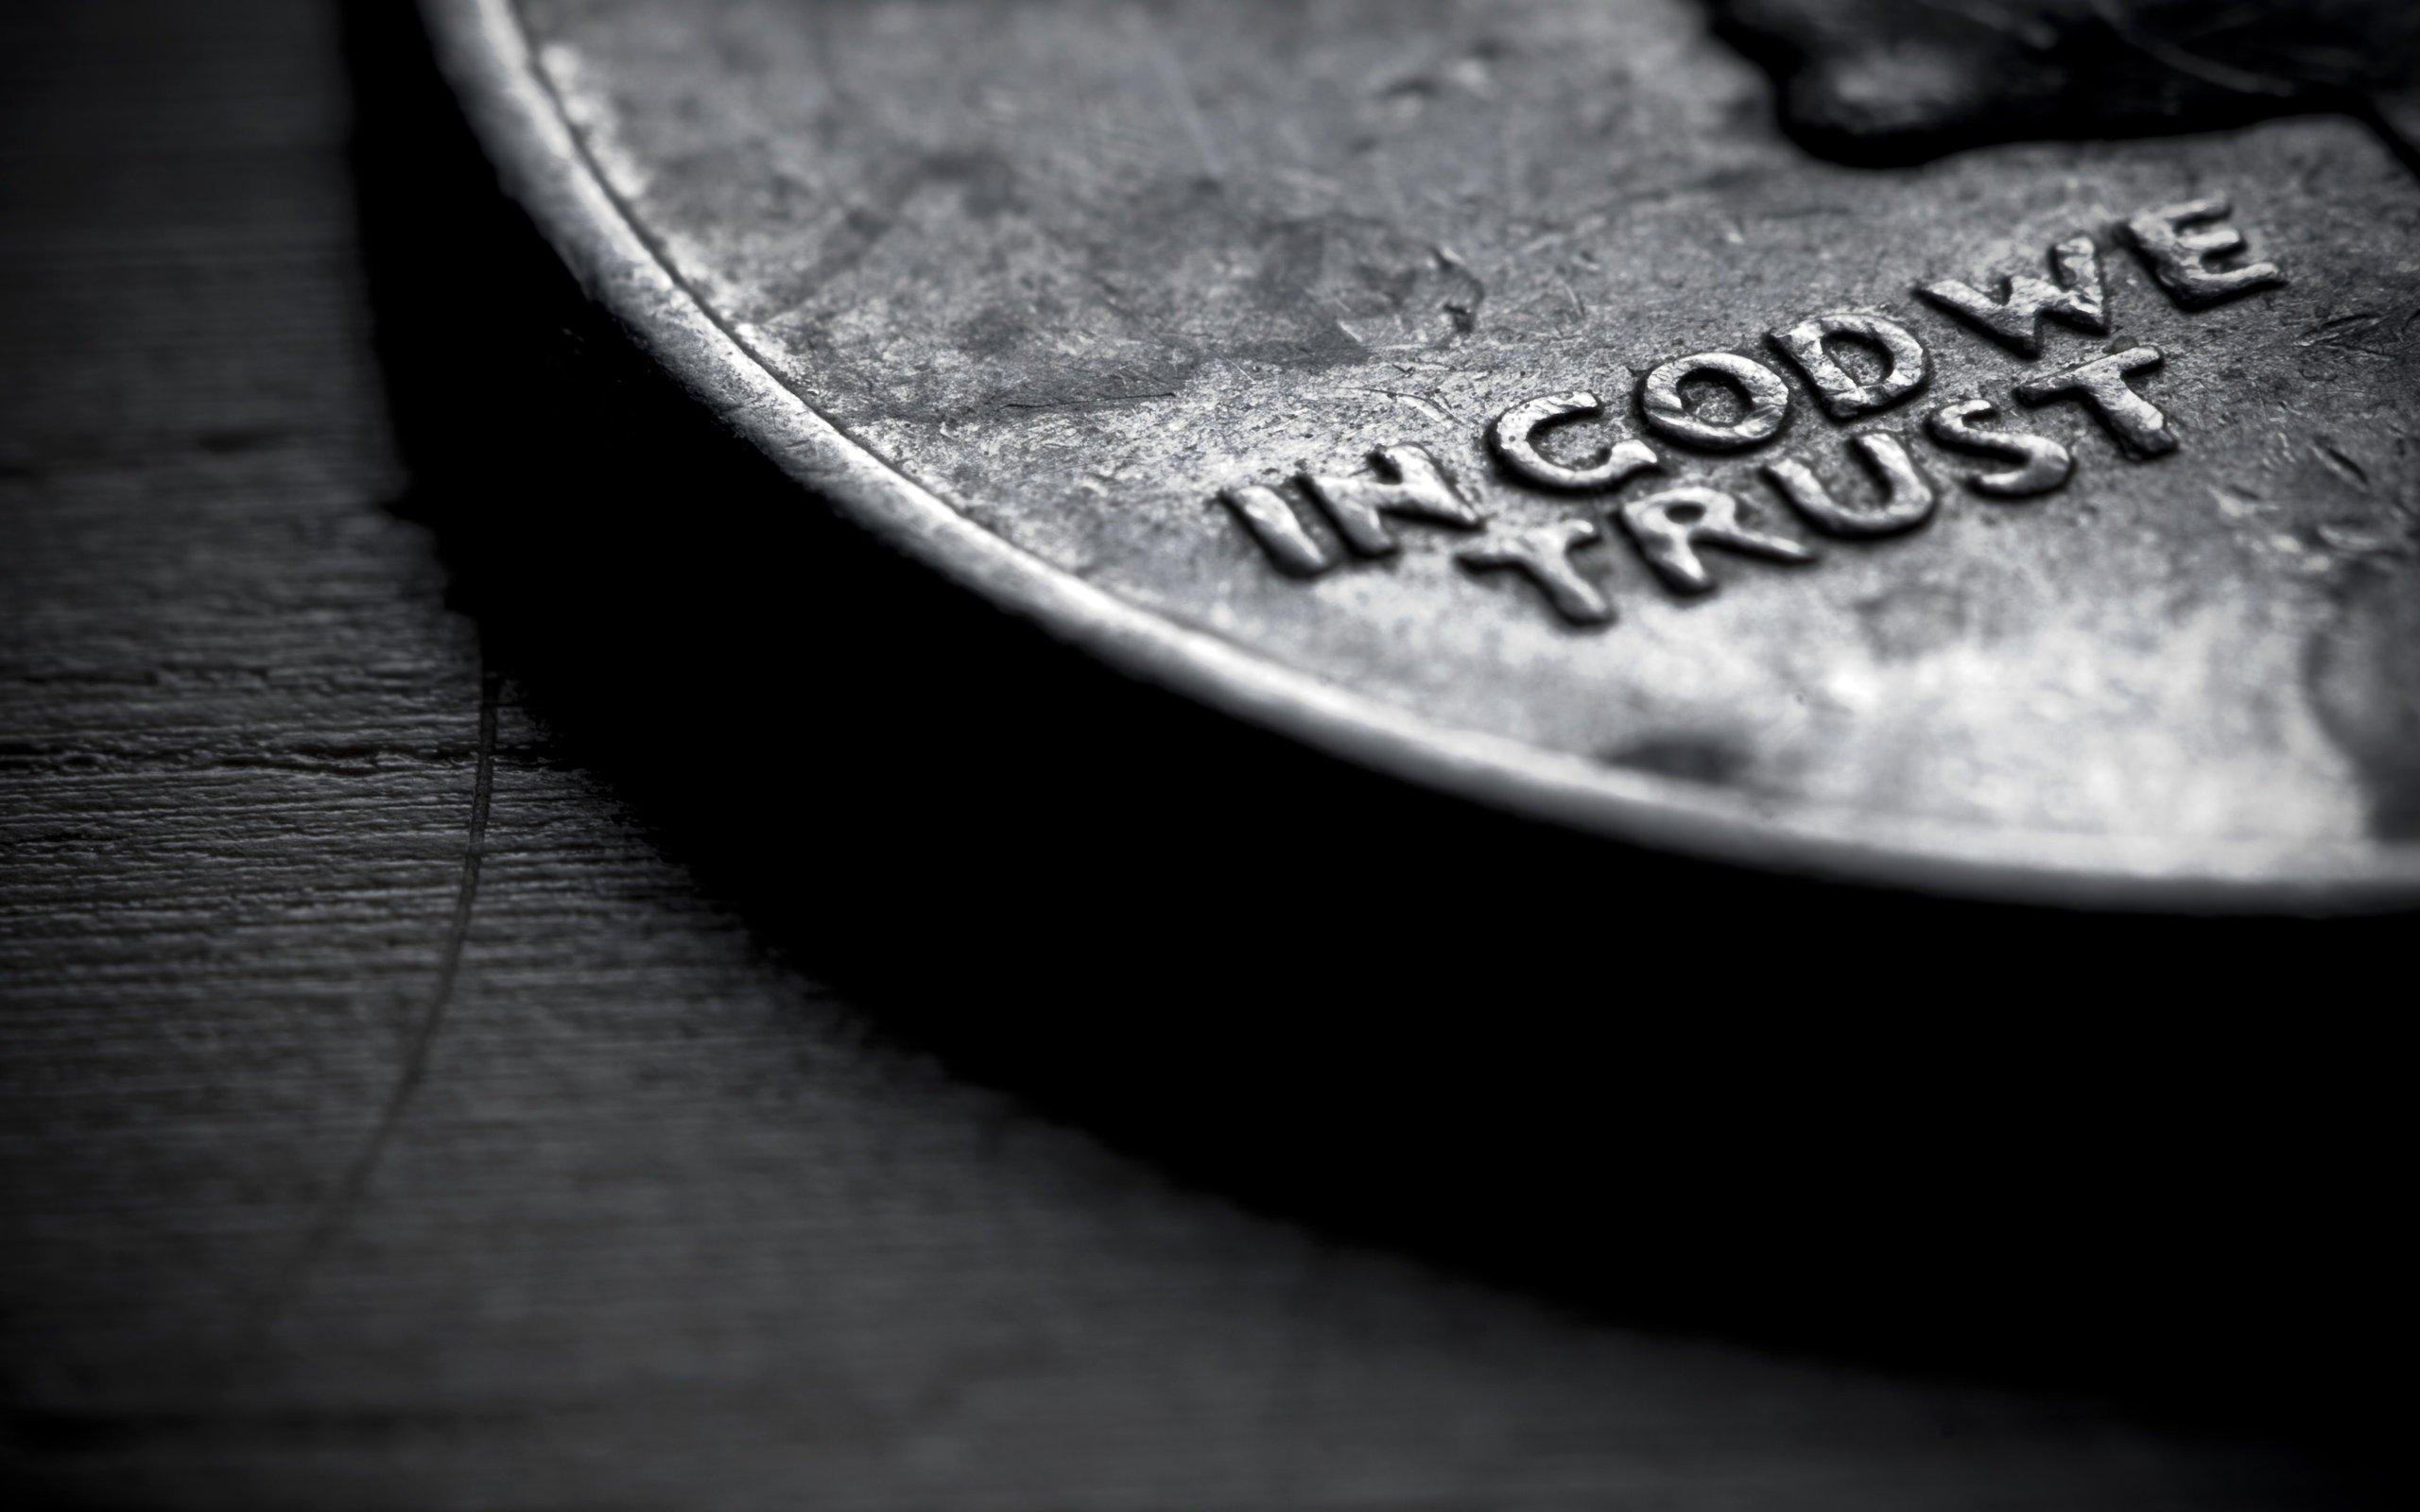 Close-up coins money text God trust wallpaper | 2560x1600 | 258196 ...